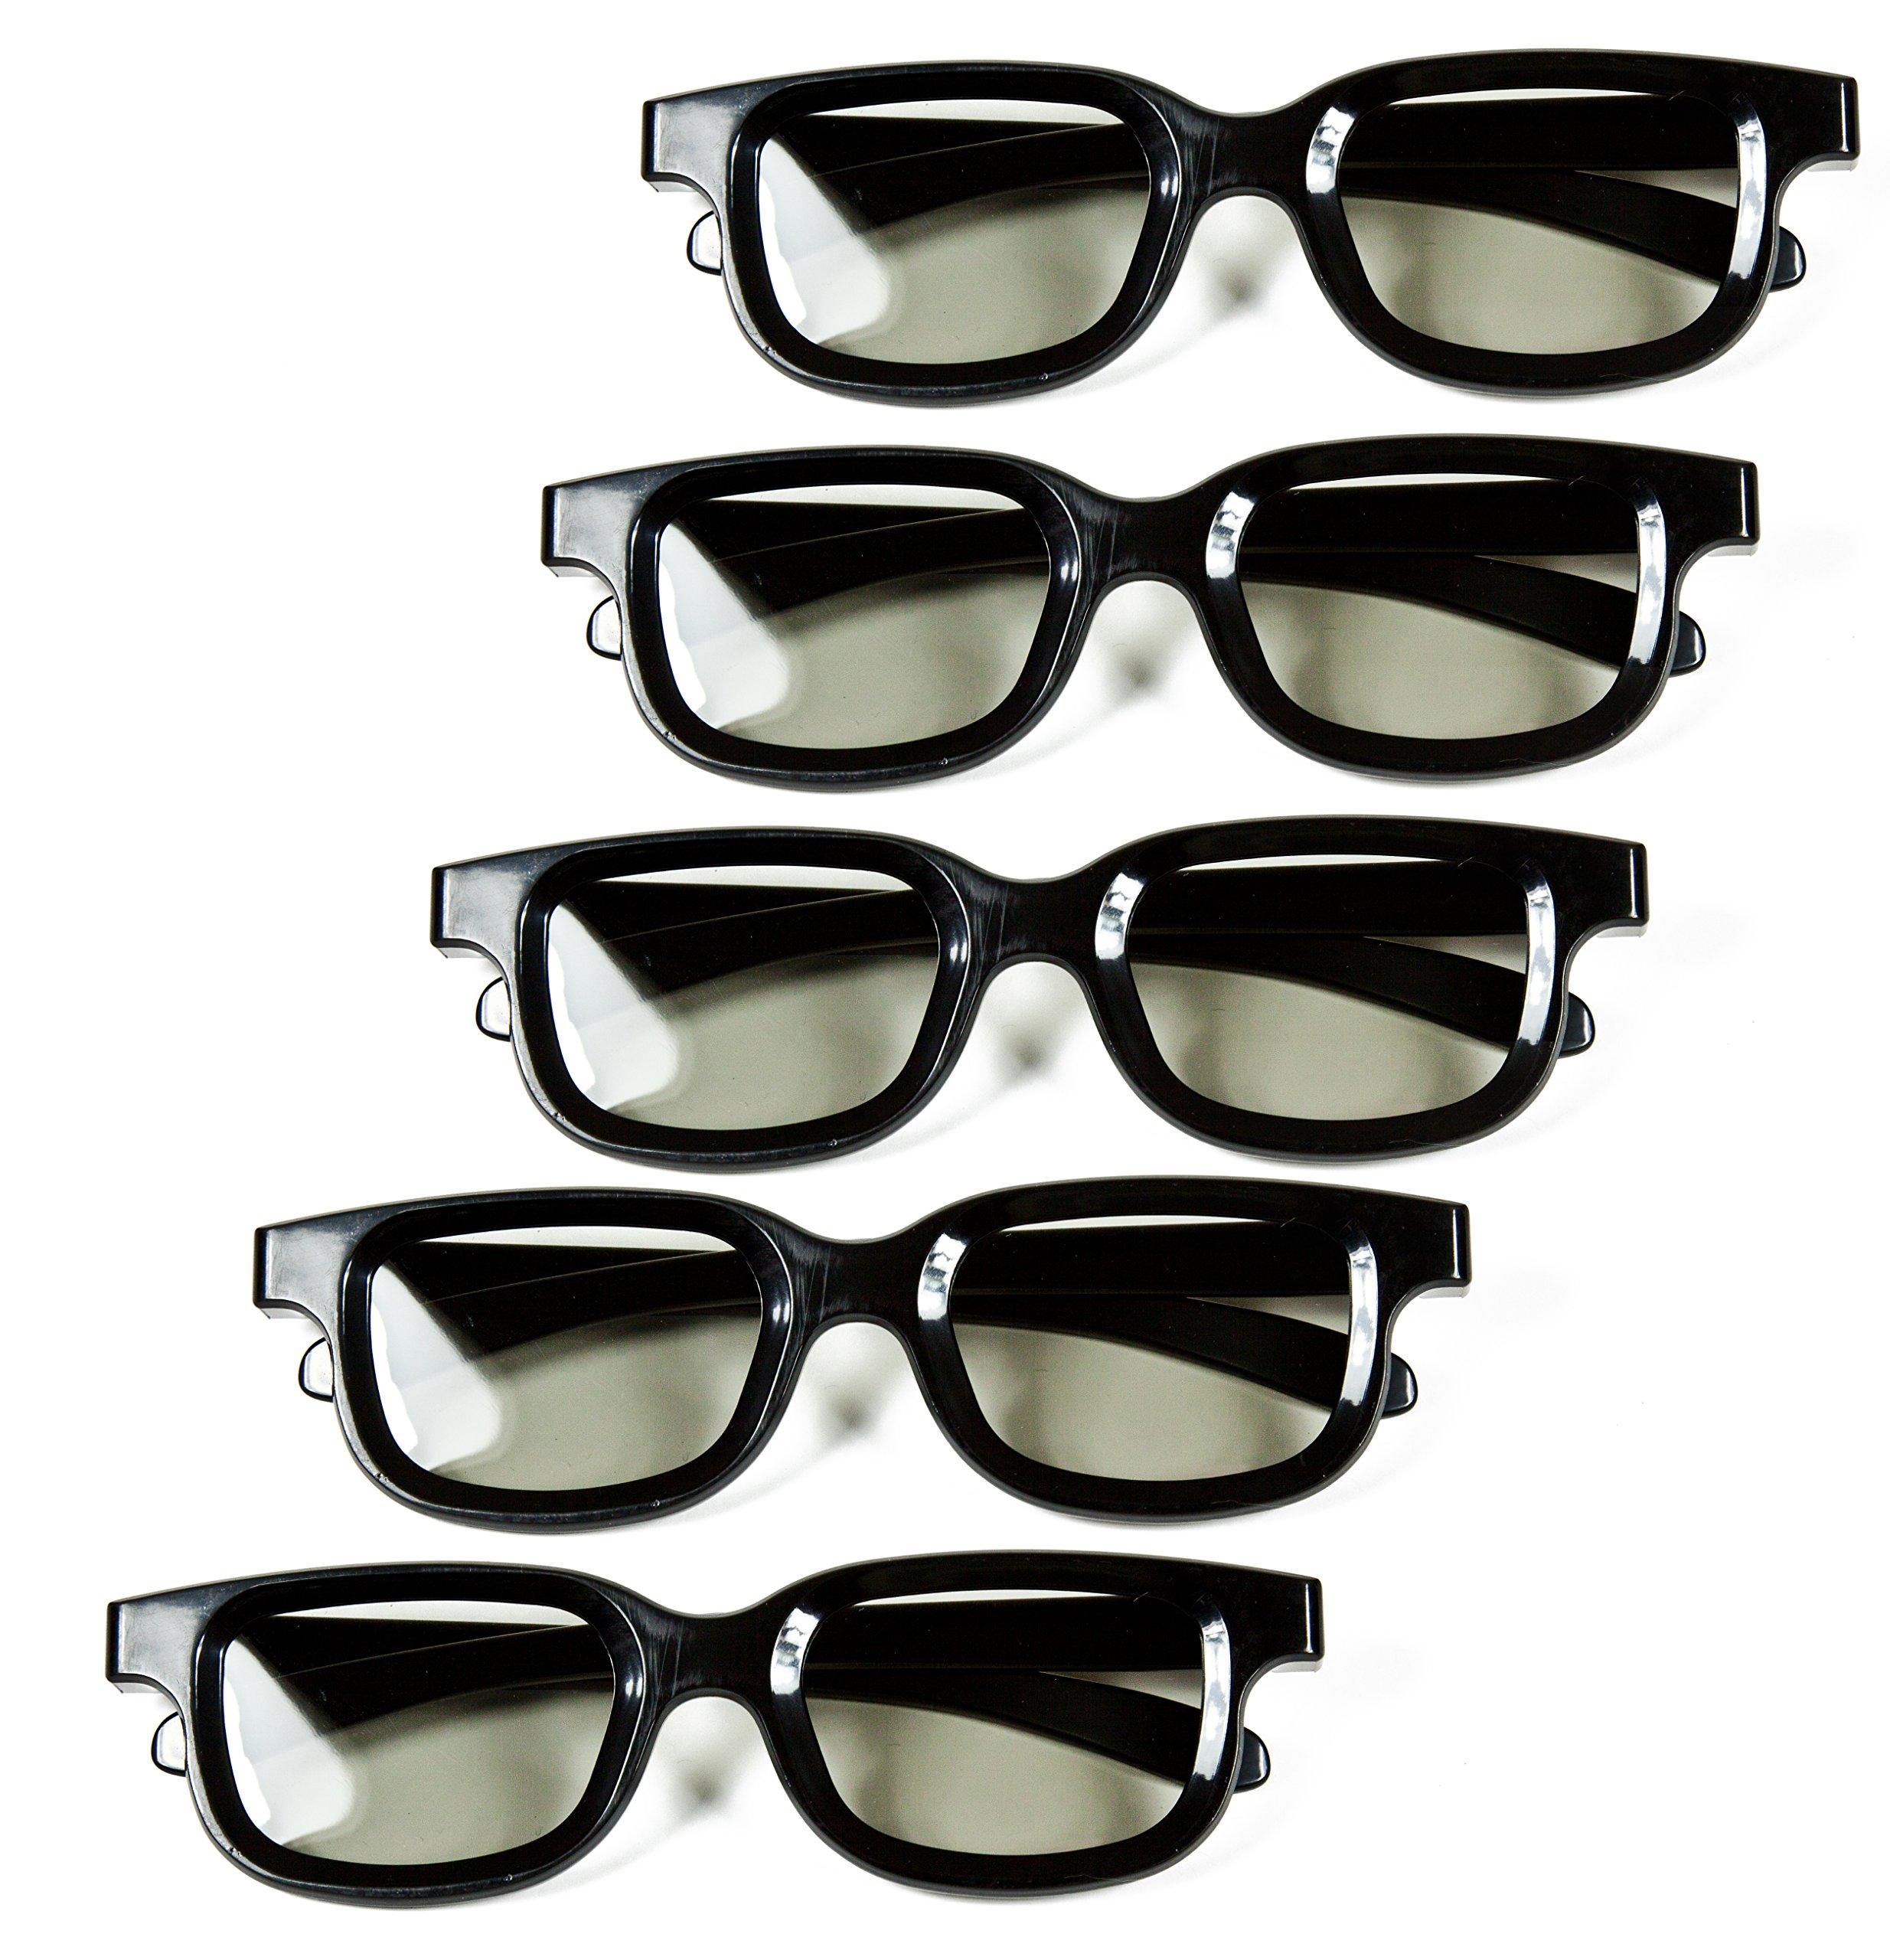 Optical Prime 3D (5 Pack) 3D Cinema Glasses For Passive TVs – Movie Theater Glasses - Circular Polarized.